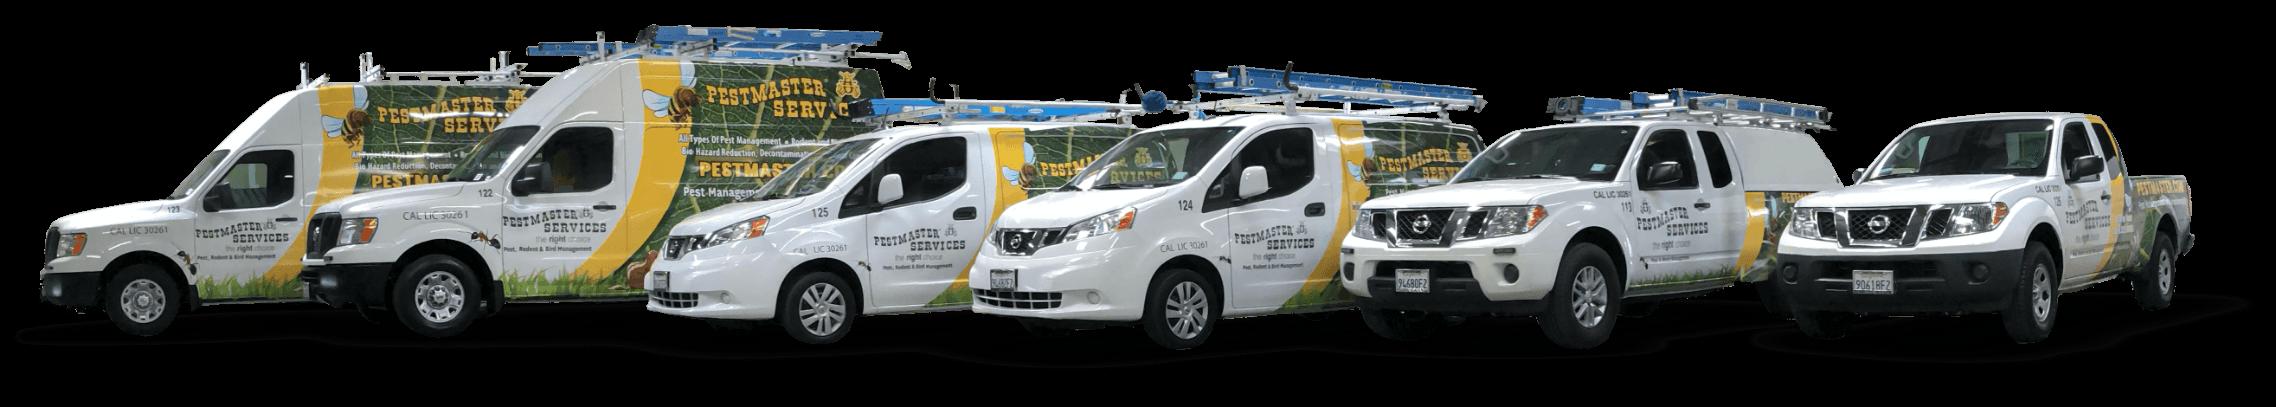 pestmaster services fleet